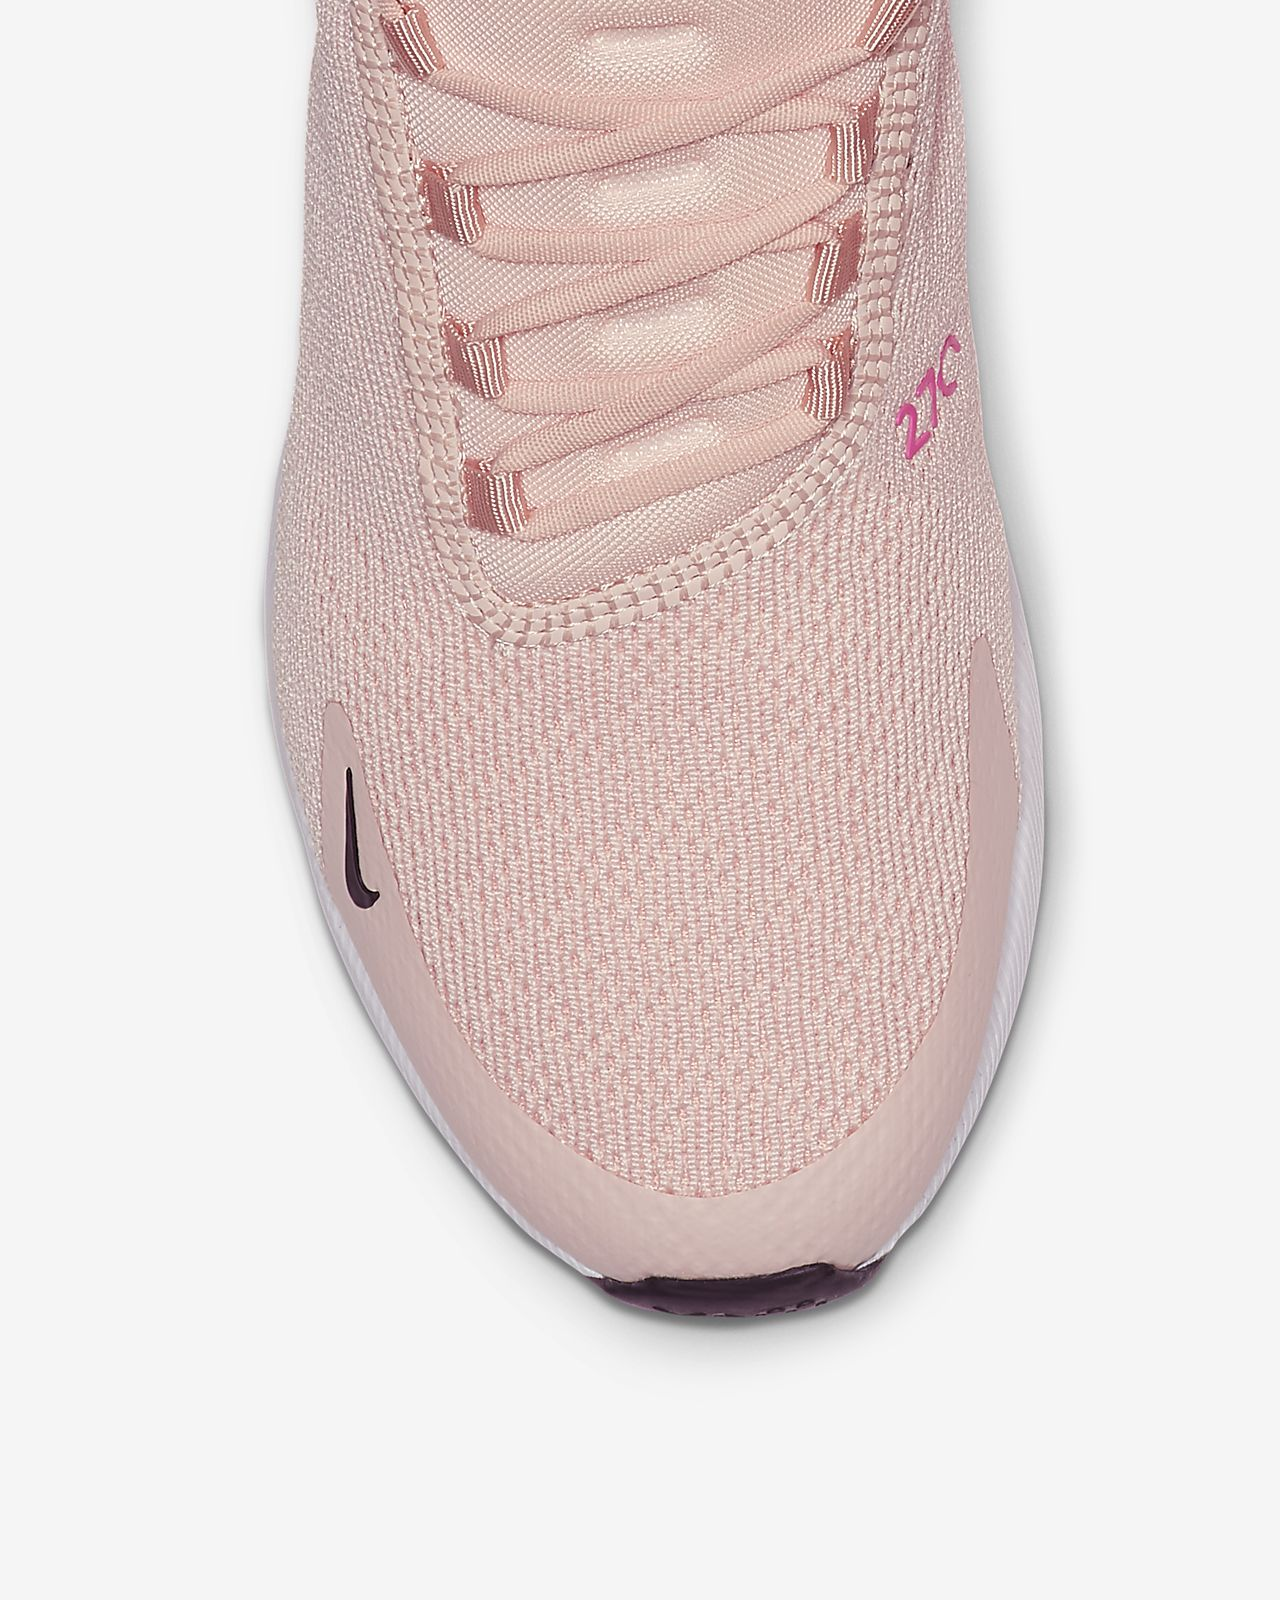 separation shoes 71012 5e68a ... Nike Air Max 270 Women s Shoe